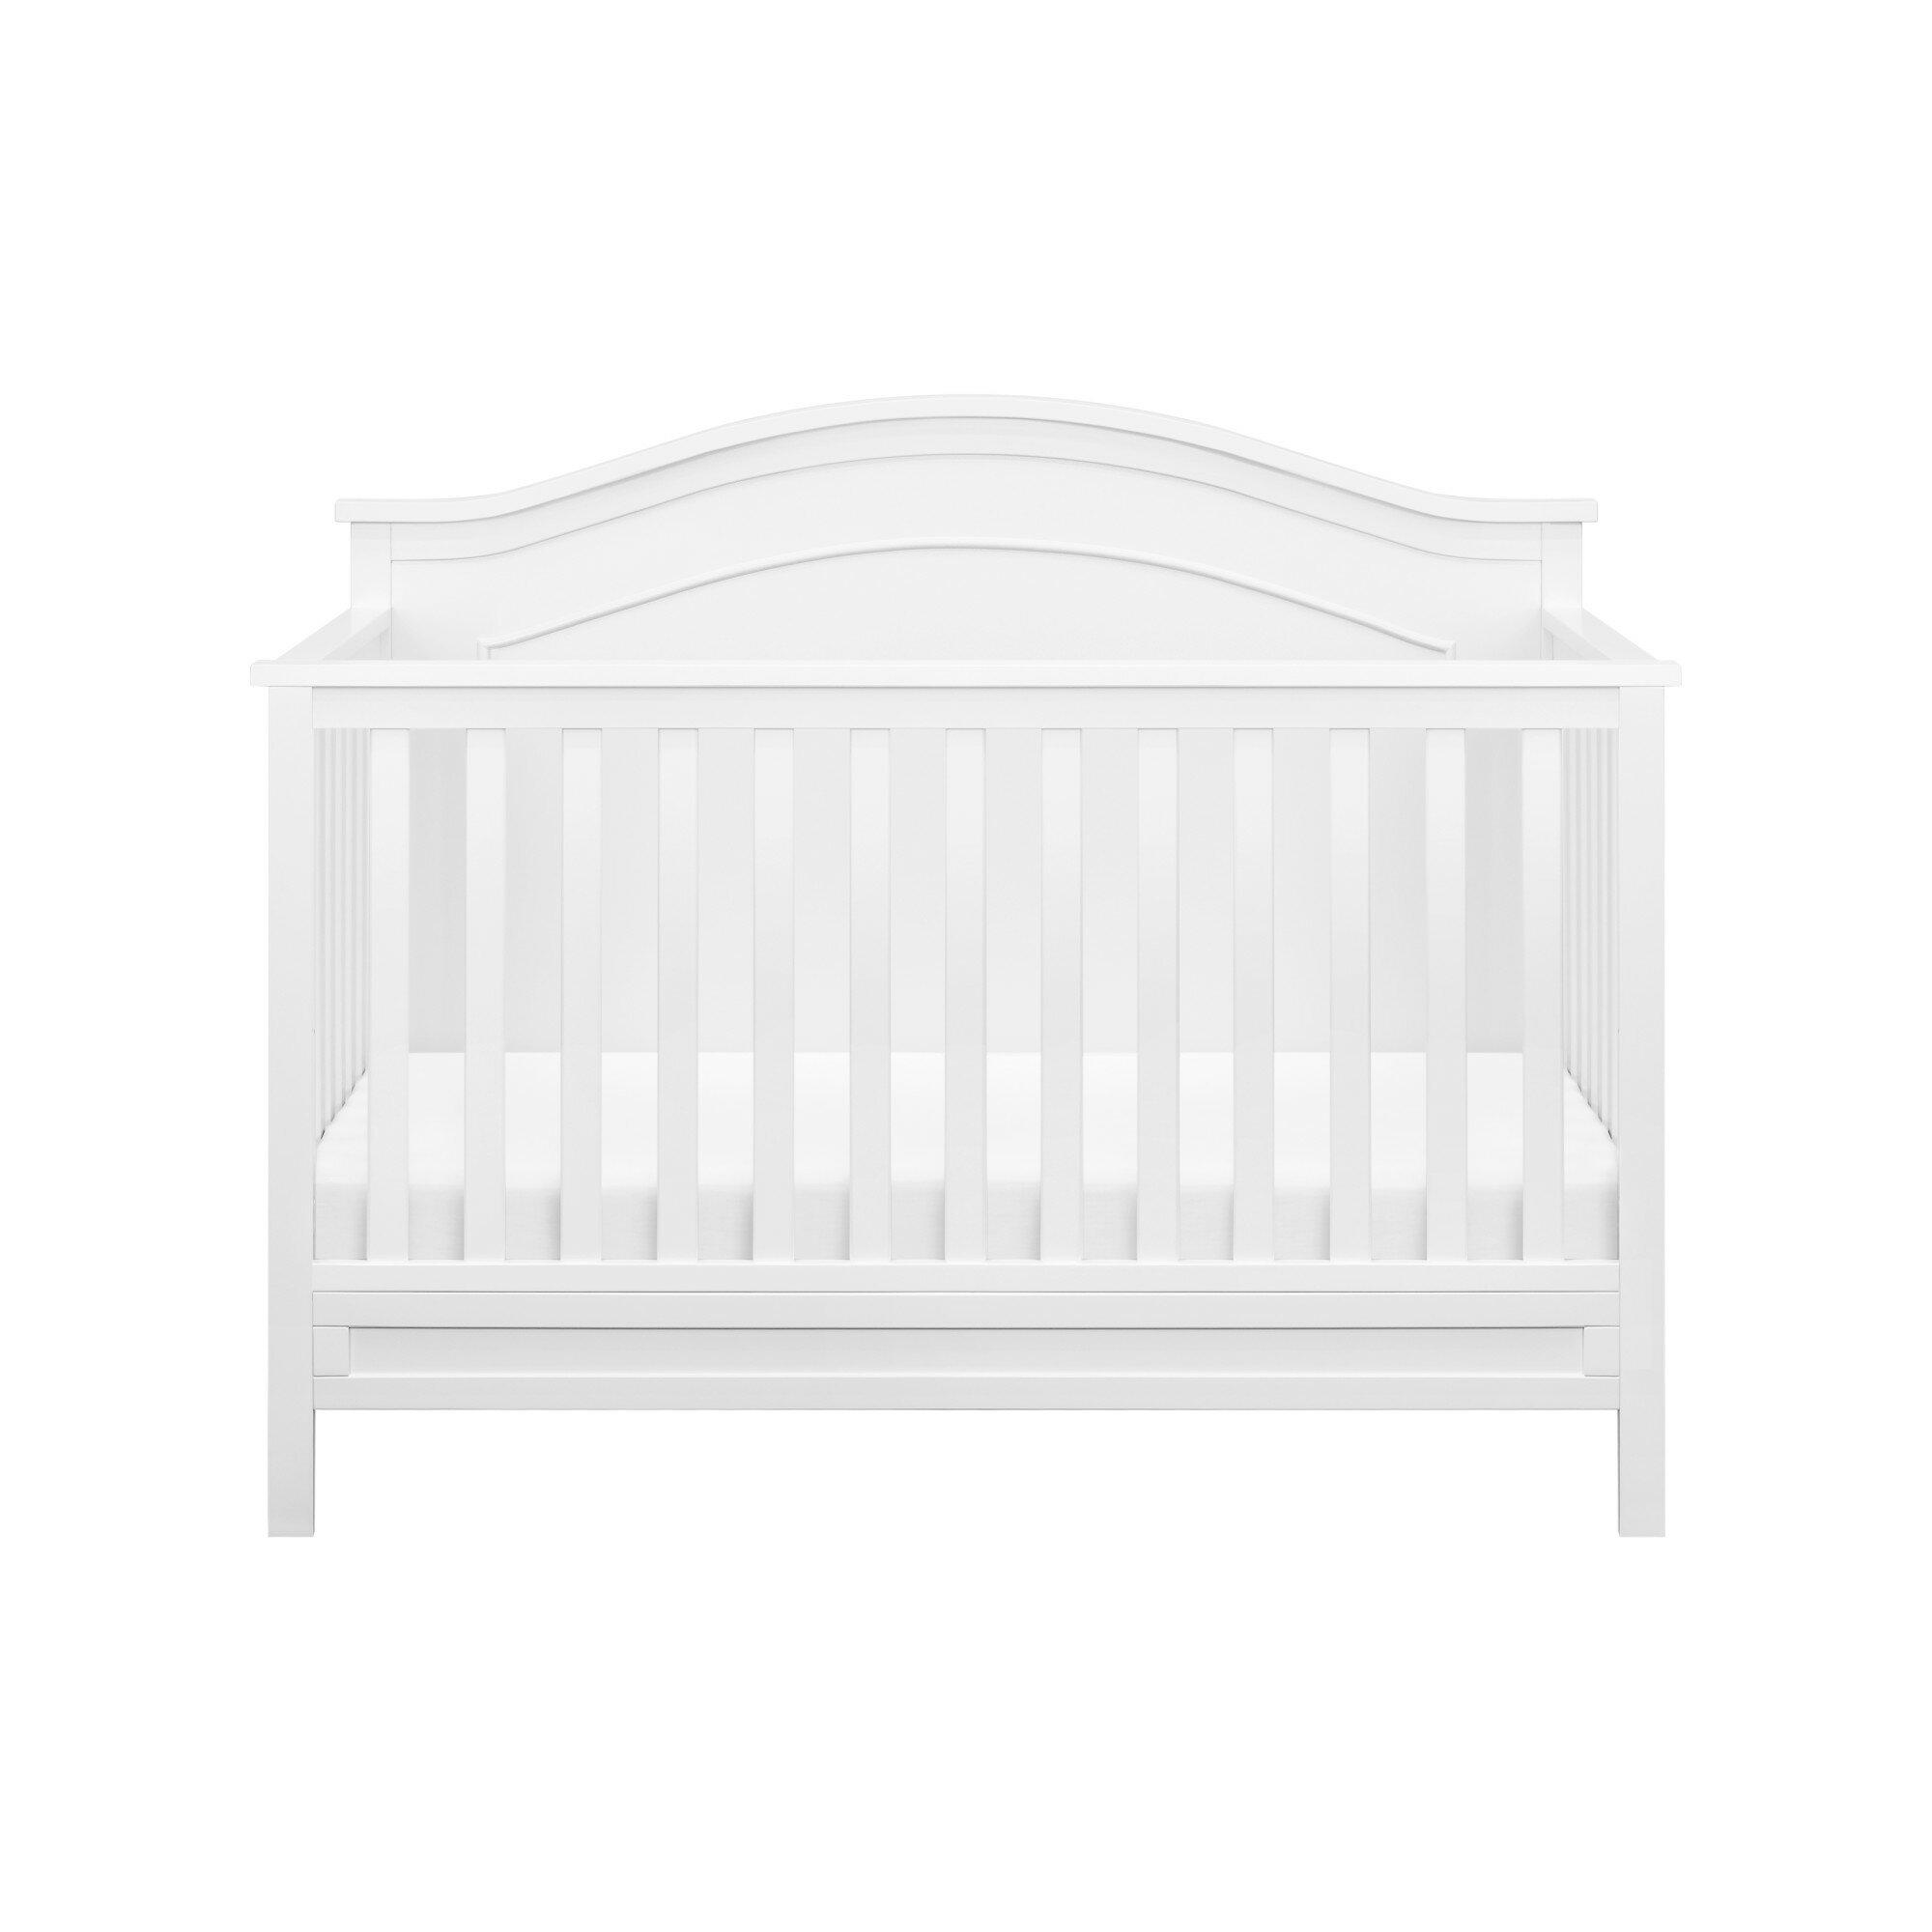 ca cribs baby crib jenny wayfair davinci storkcraft in convertible beckett reviews lind pdp kids